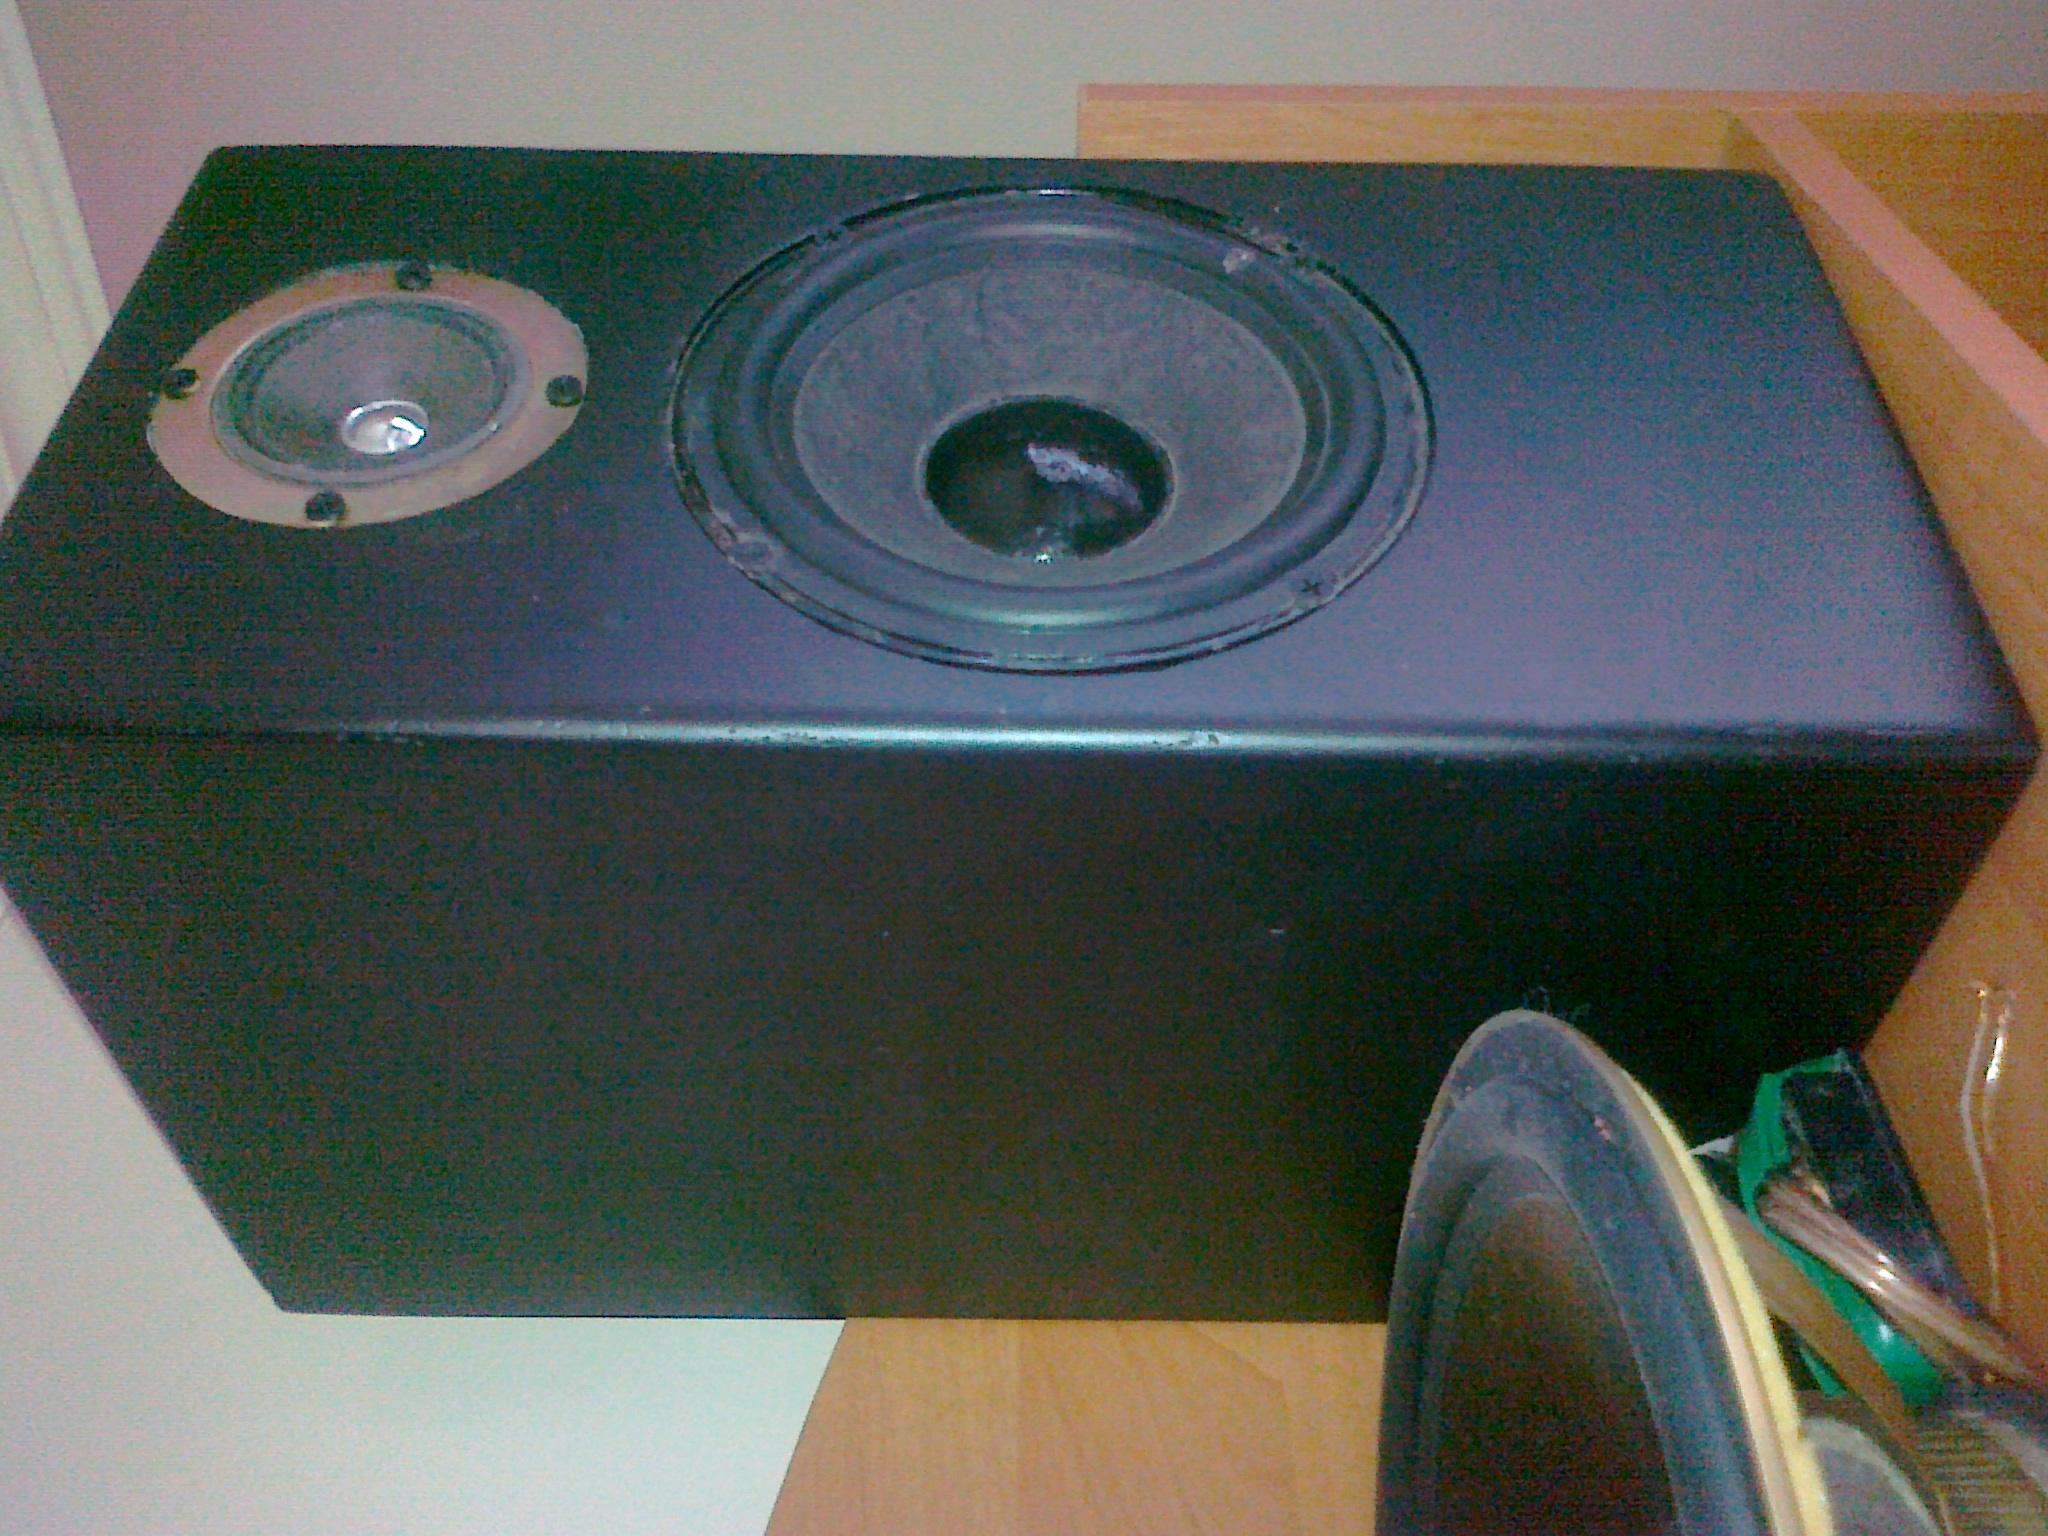 Alphard LW 650 4ohm Bass-reflex